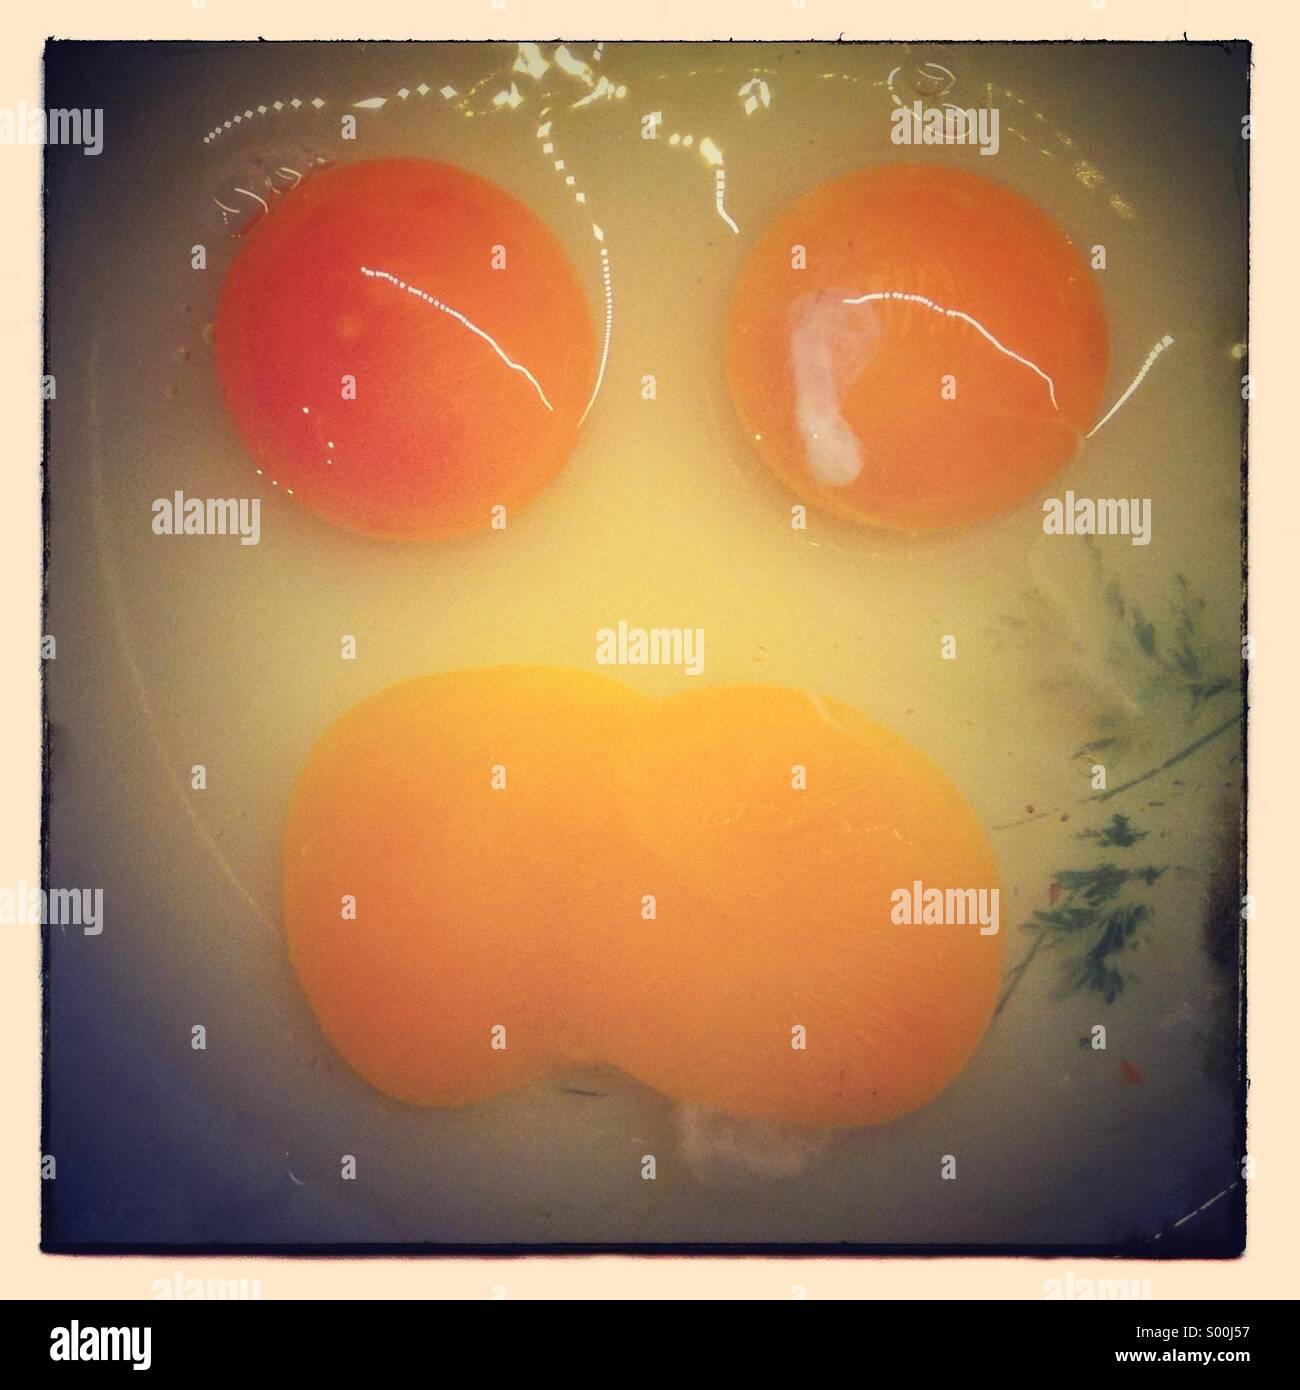 Cara de yema de huevos rotos. Caras en objetos Foto de stock